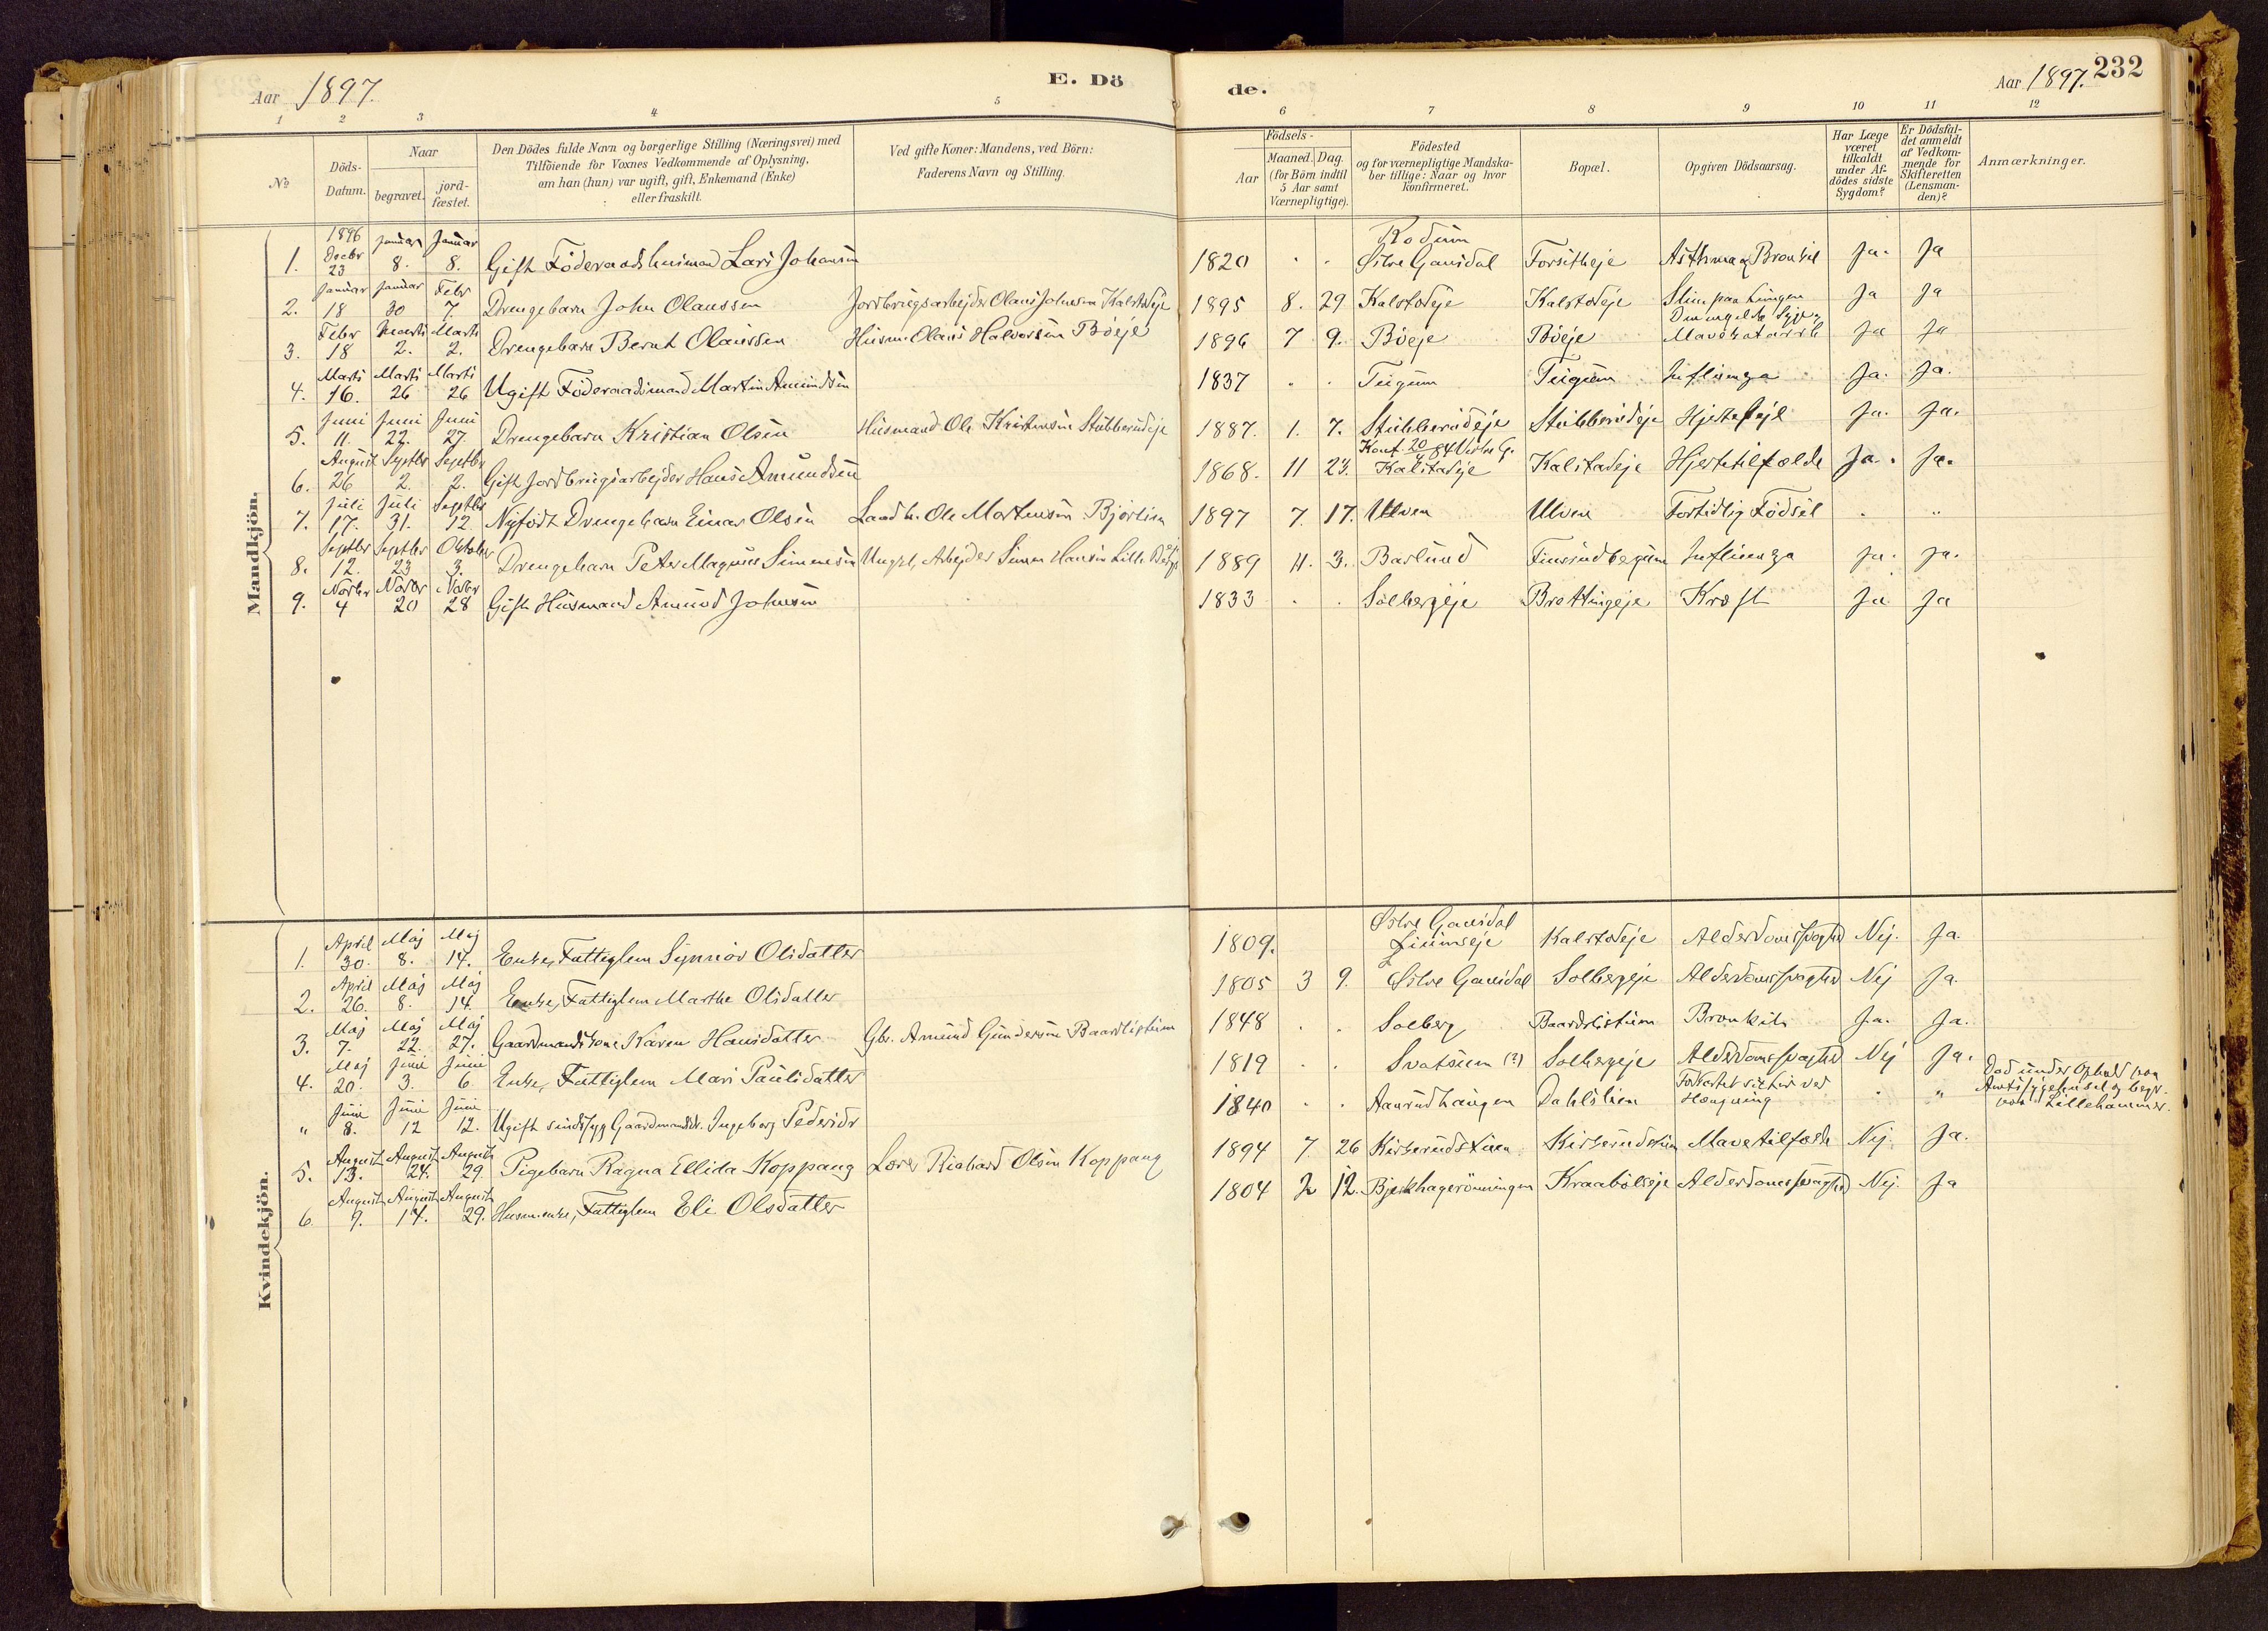 SAH, Vestre Gausdal prestekontor, Ministerialbok nr. 1, 1887-1914, s. 232